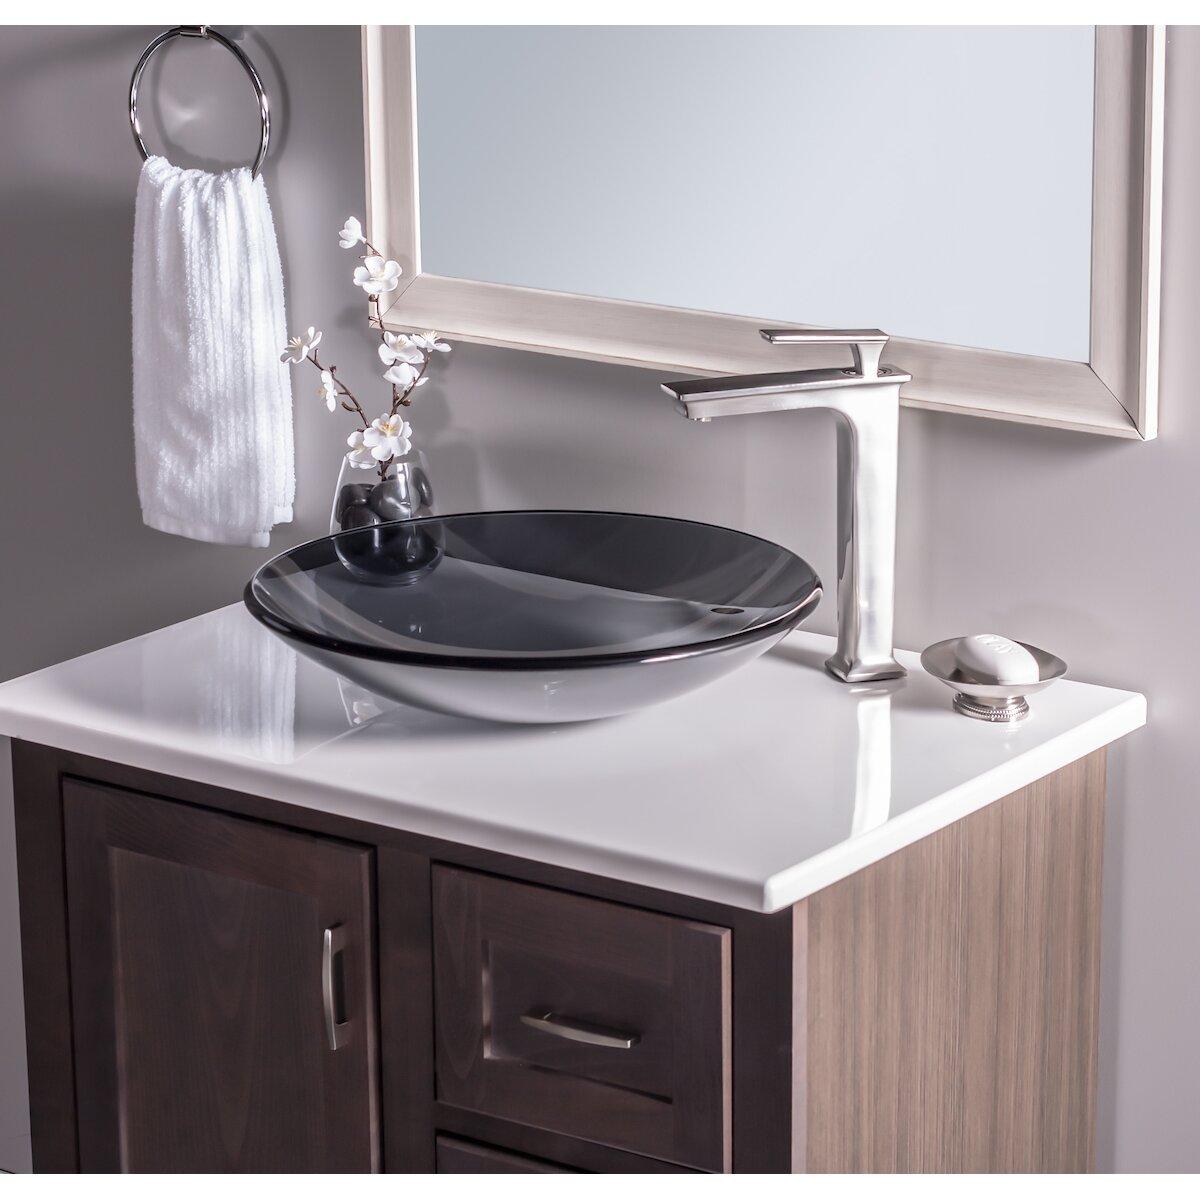 Low Profile Vessel : Novatto Low Profile Glass Vessel Bathroom Sink & Reviews Wayfair